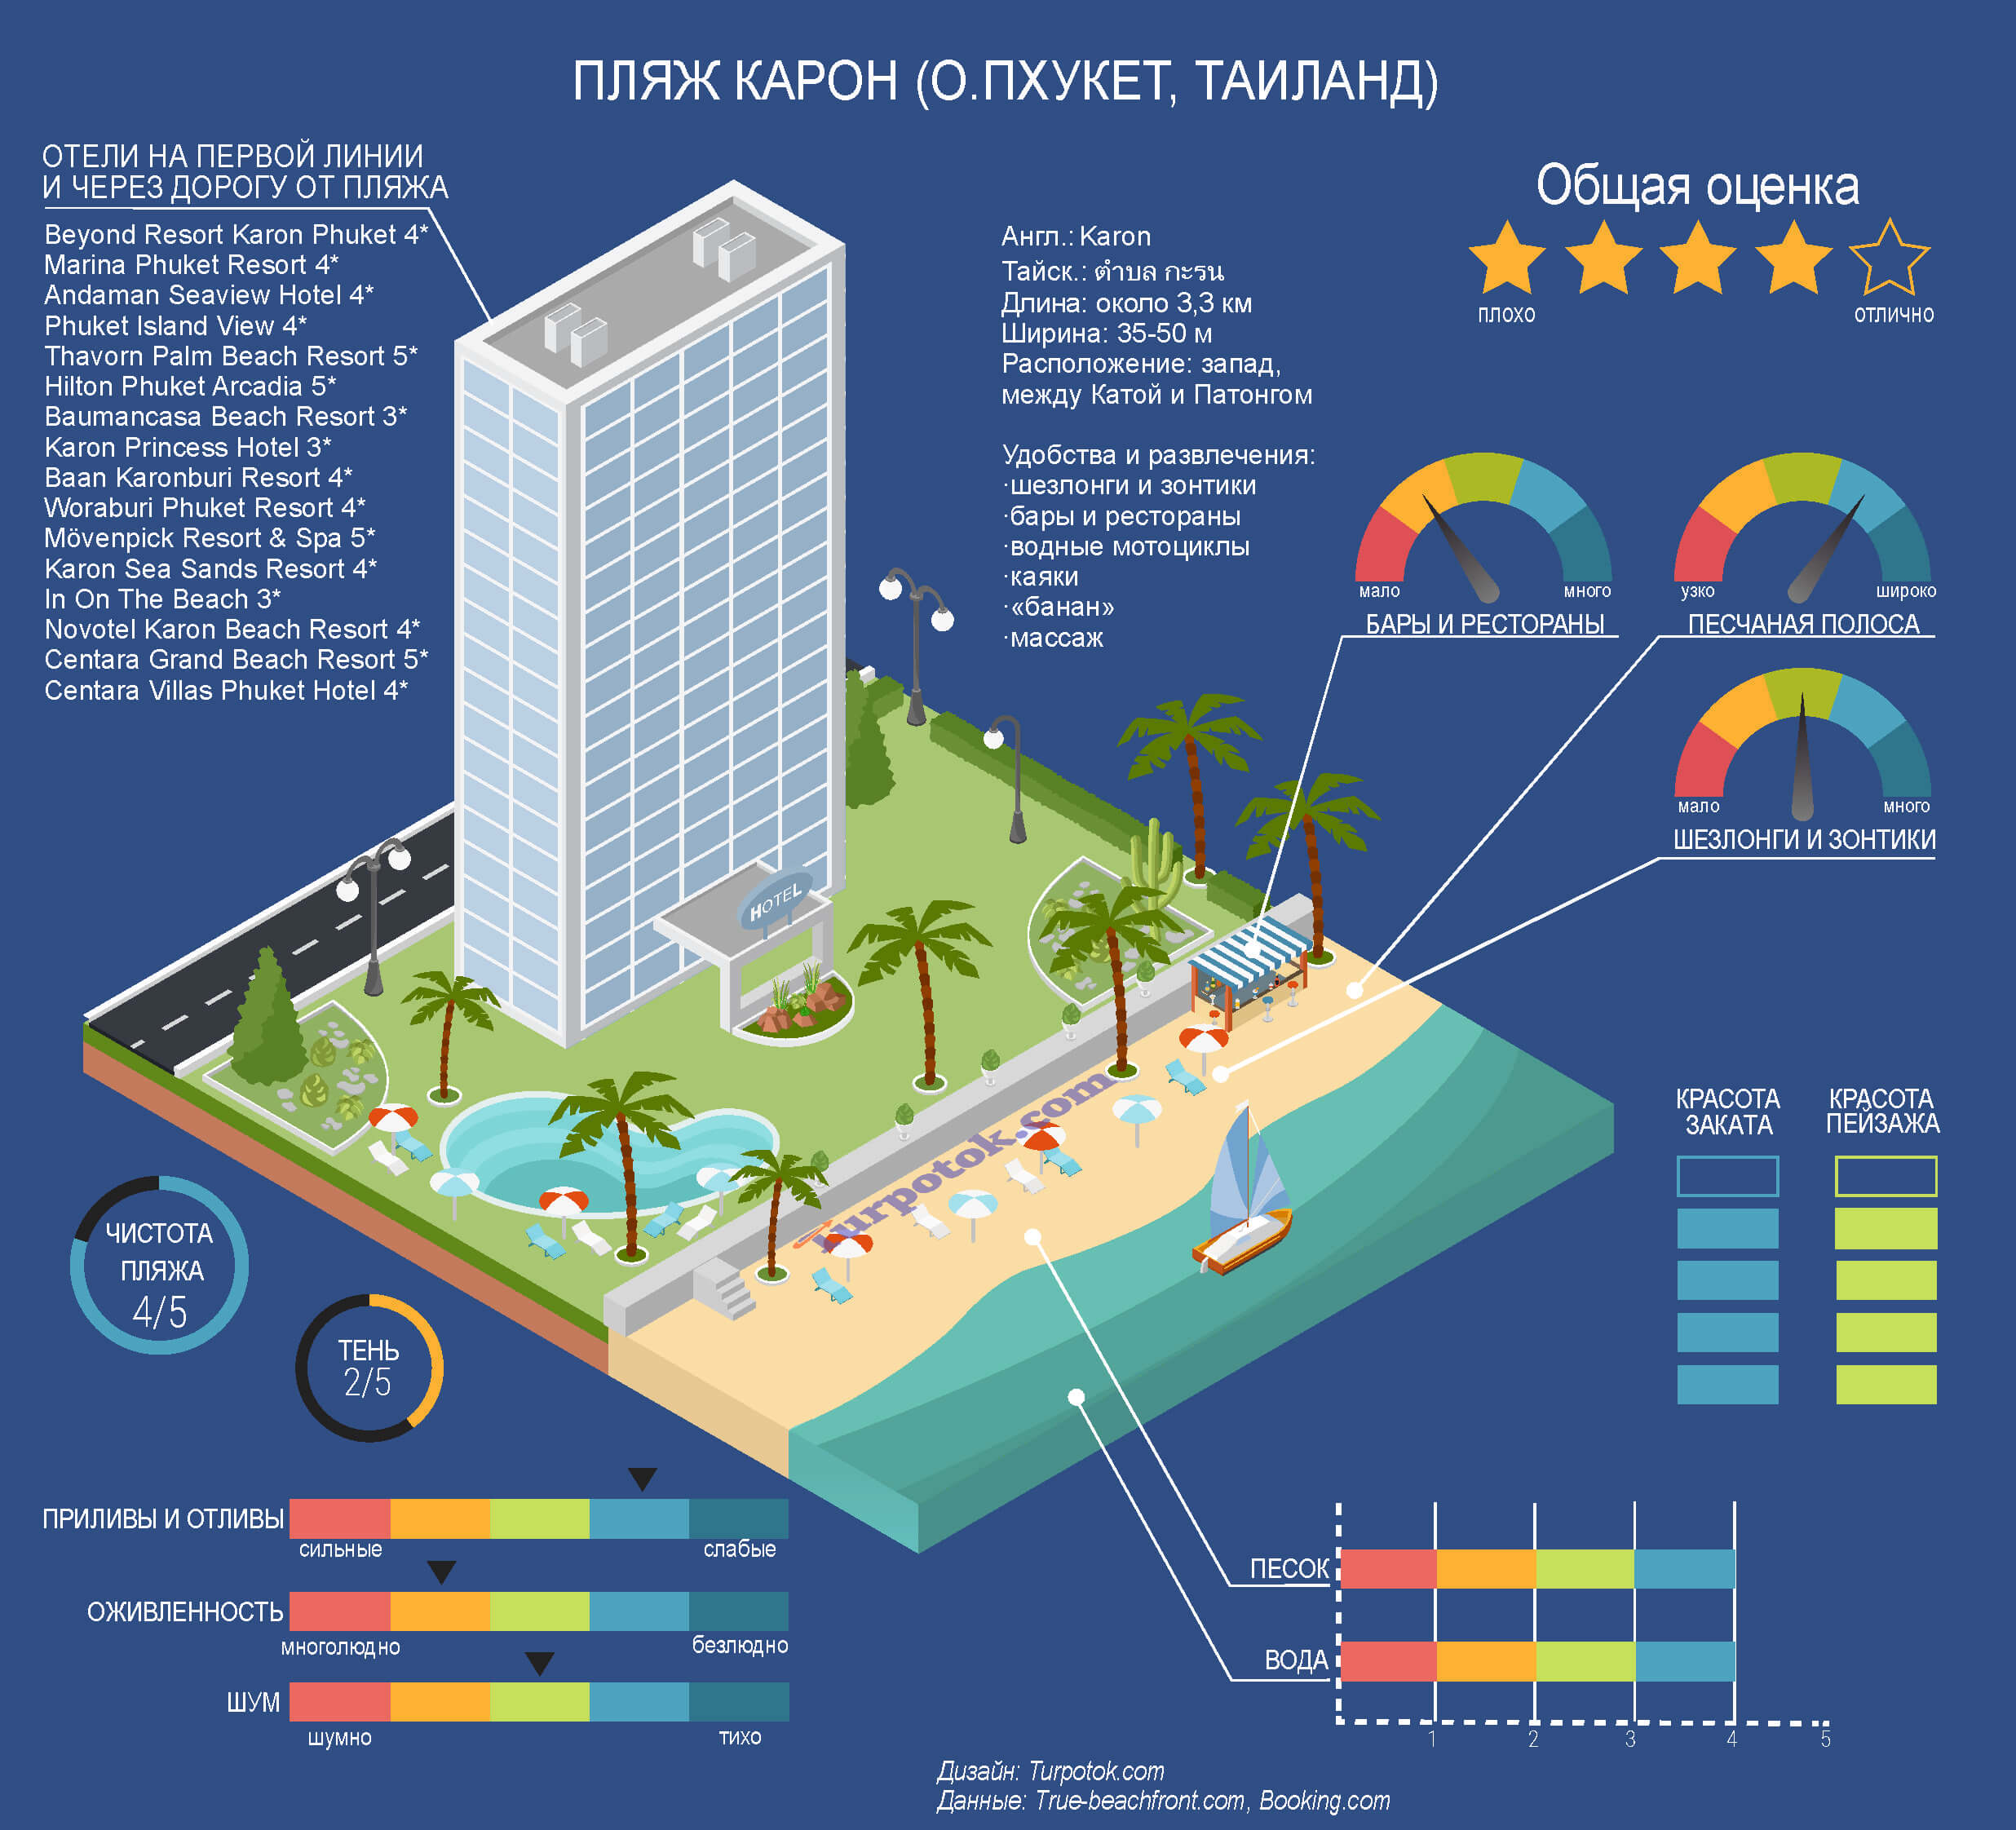 Инфографика про пляж Карон на Пхукете